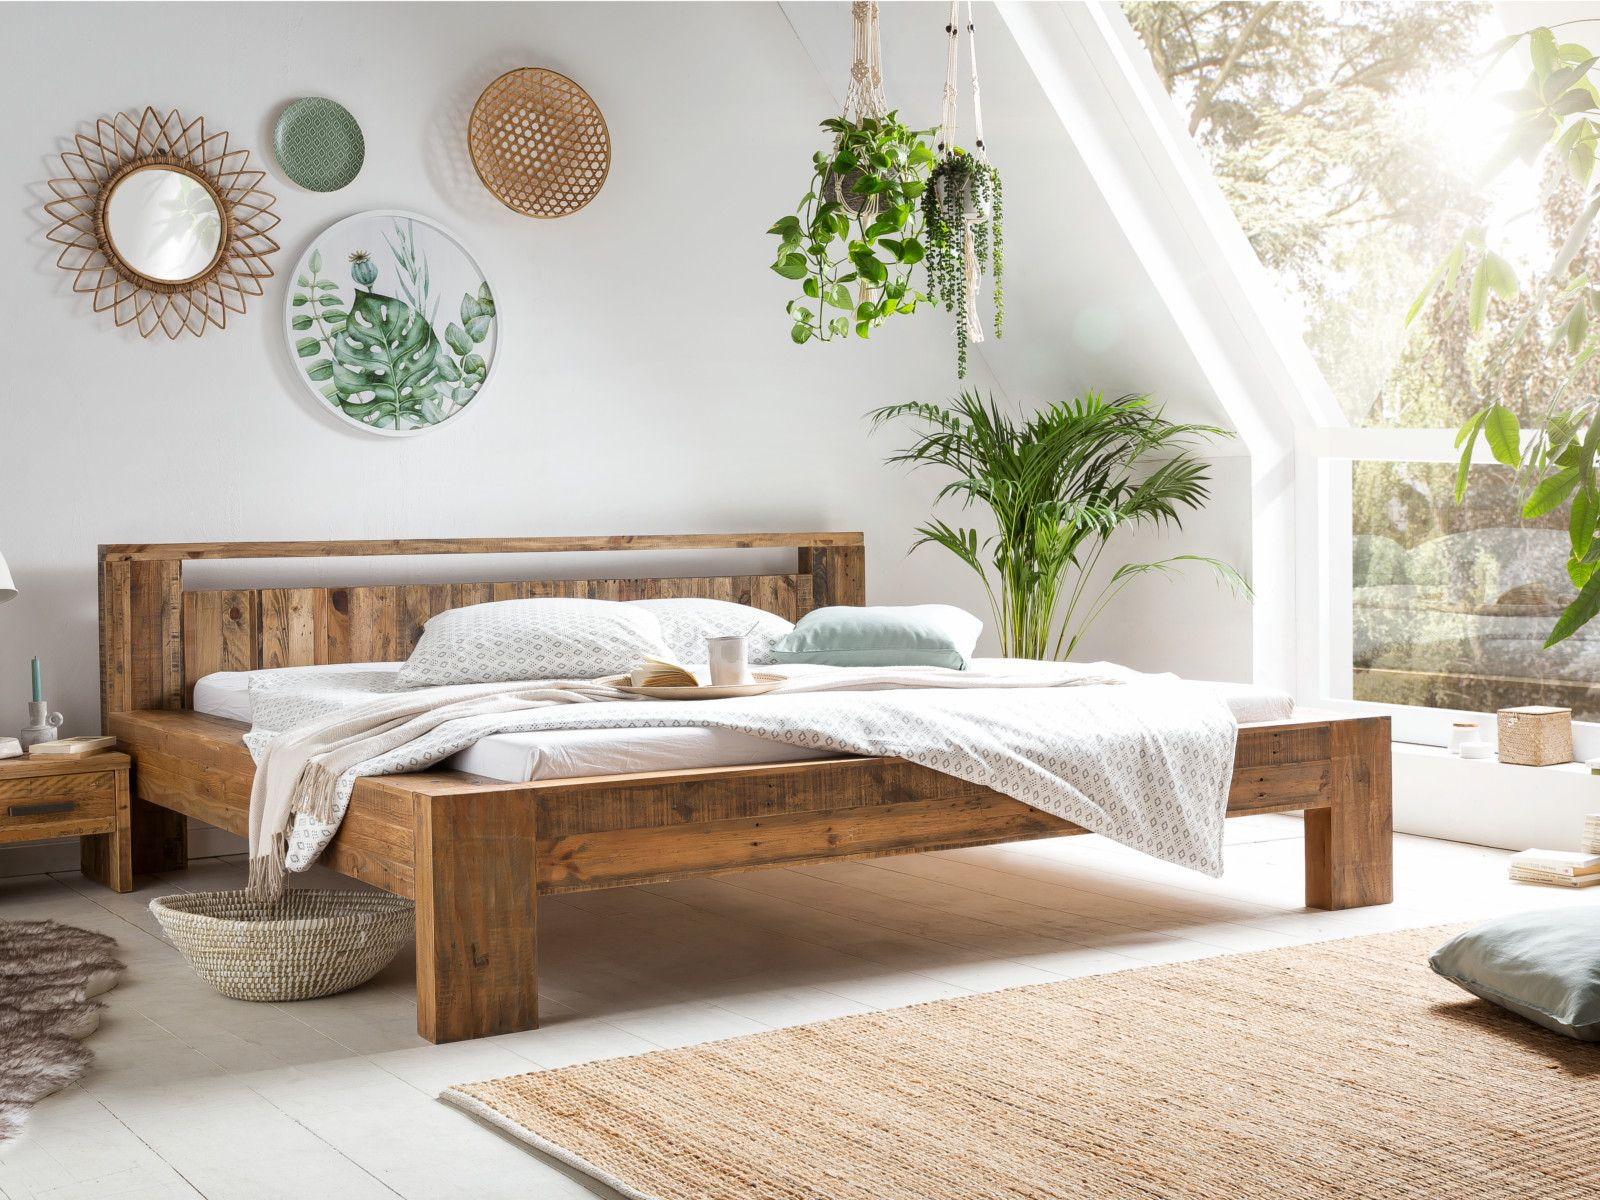 Holzbett Scottburgh Schlafzimmer einrichten, Holzbetten